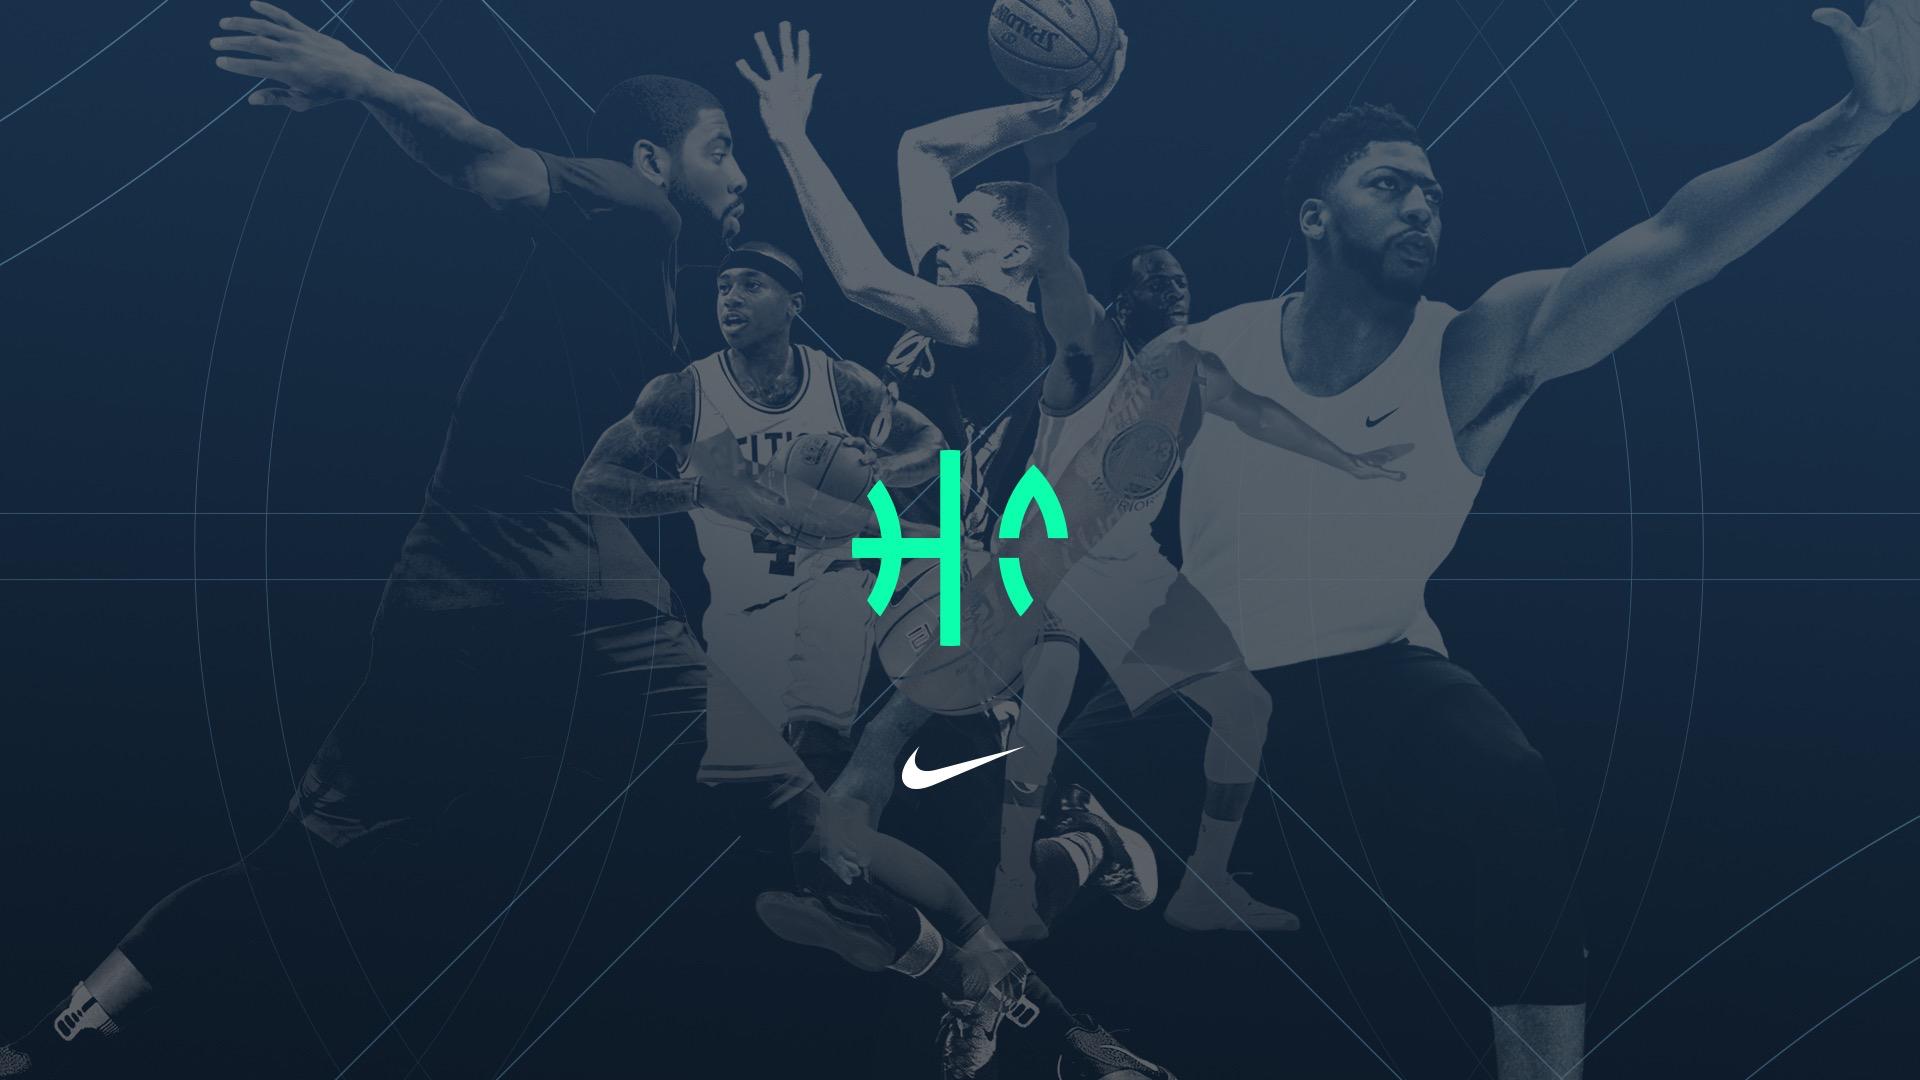 Nike bball blueprint pitchfork tomahawks nike bball blueprint malvernweather Gallery